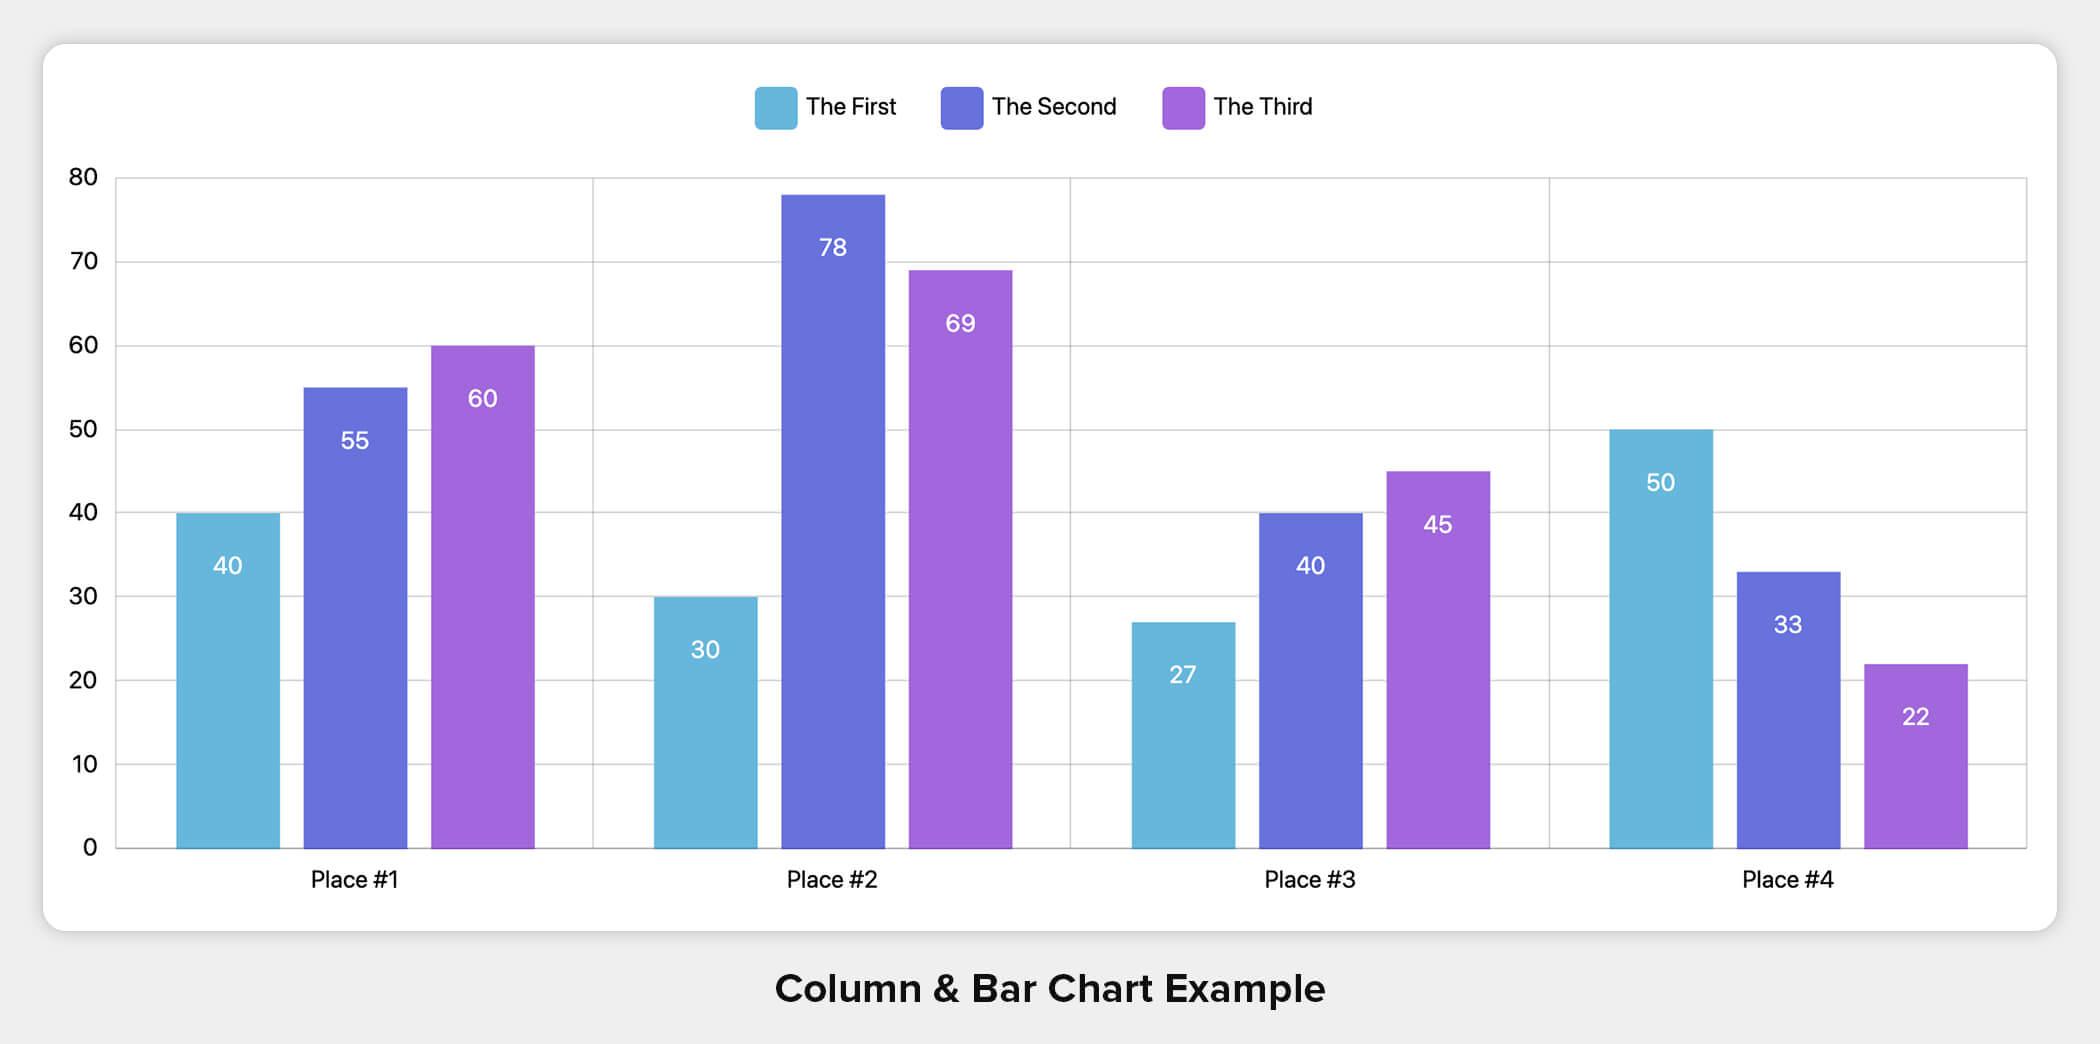 Column & Bar Chart Example